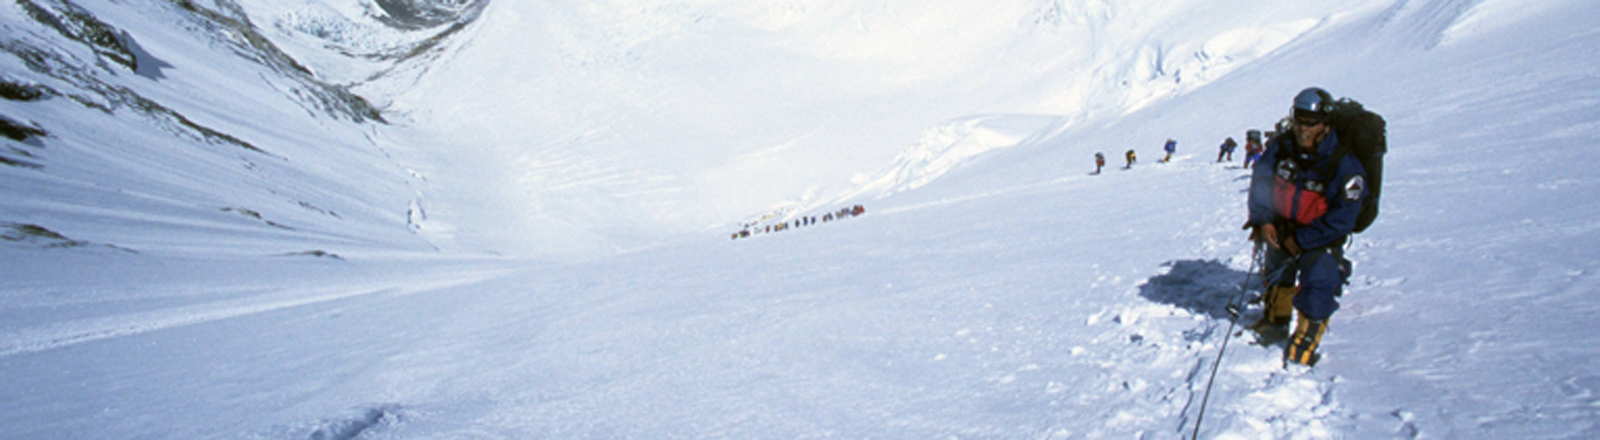 Bergsteiger im Himalaya